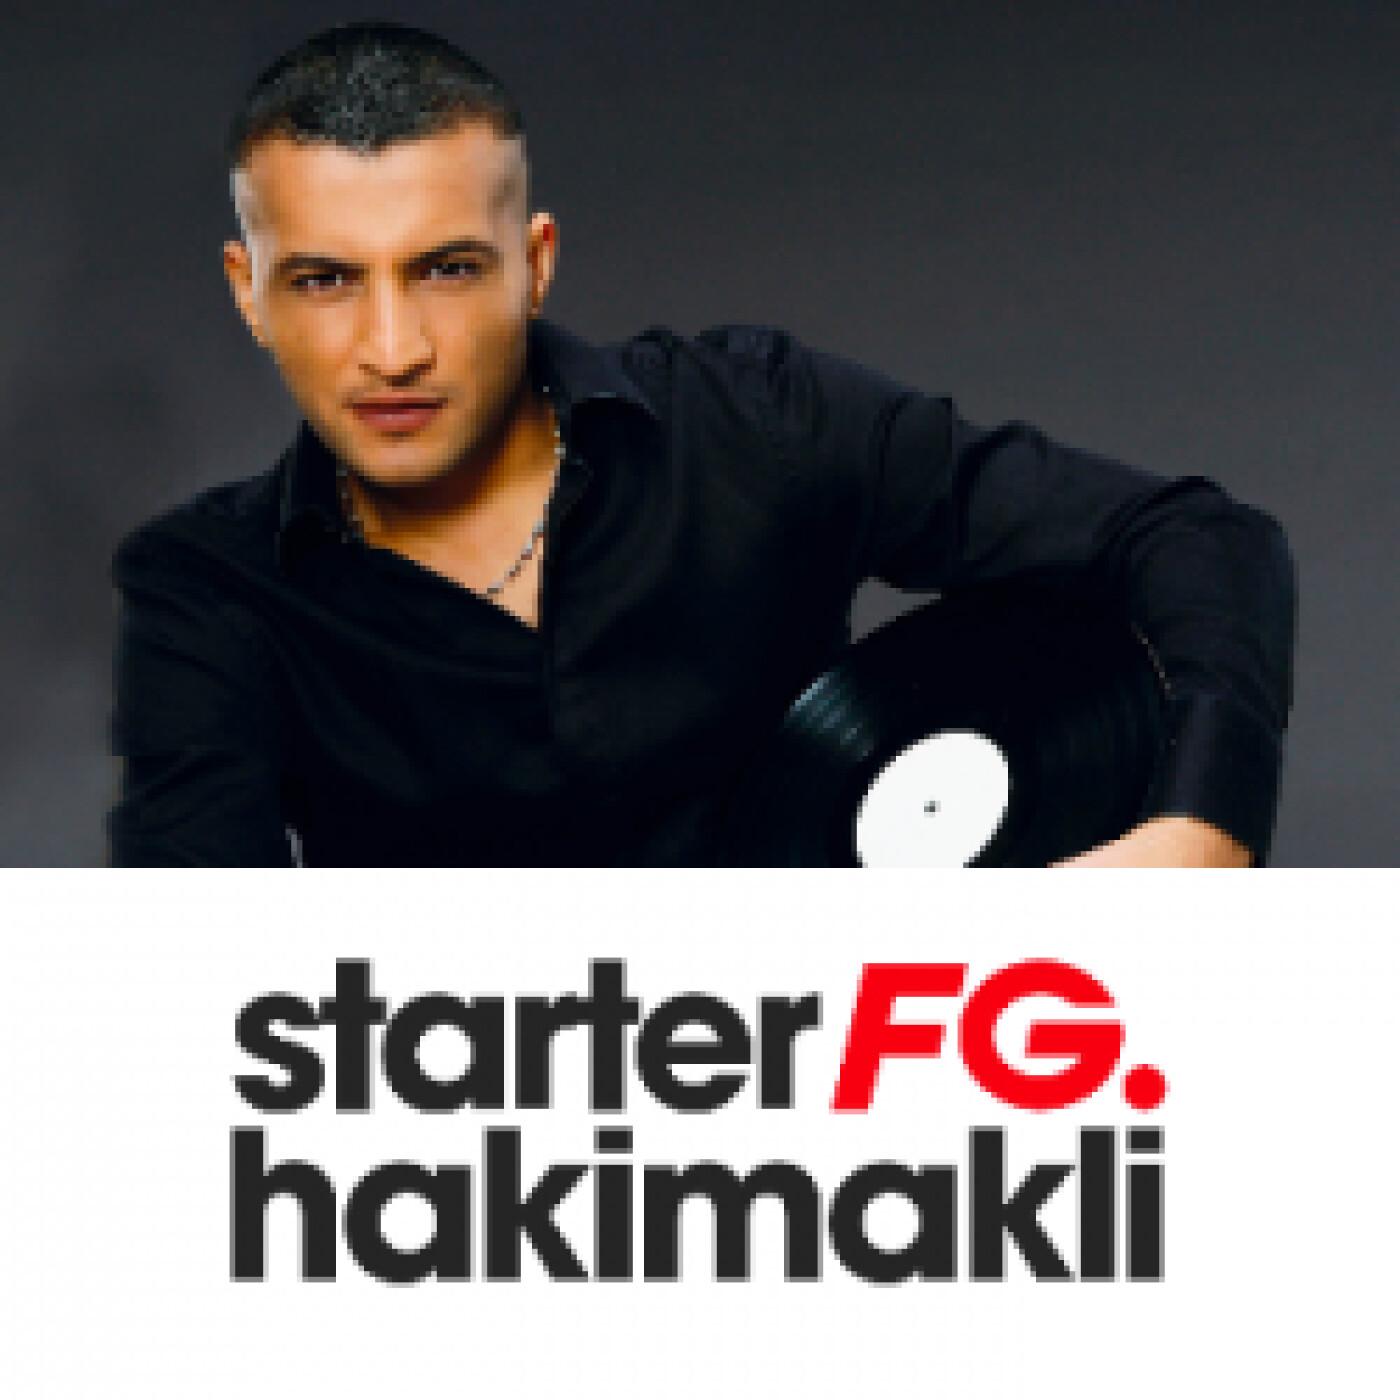 STARTER FG BY HAKIMAKLI MERCREDI 05 MAI 2021